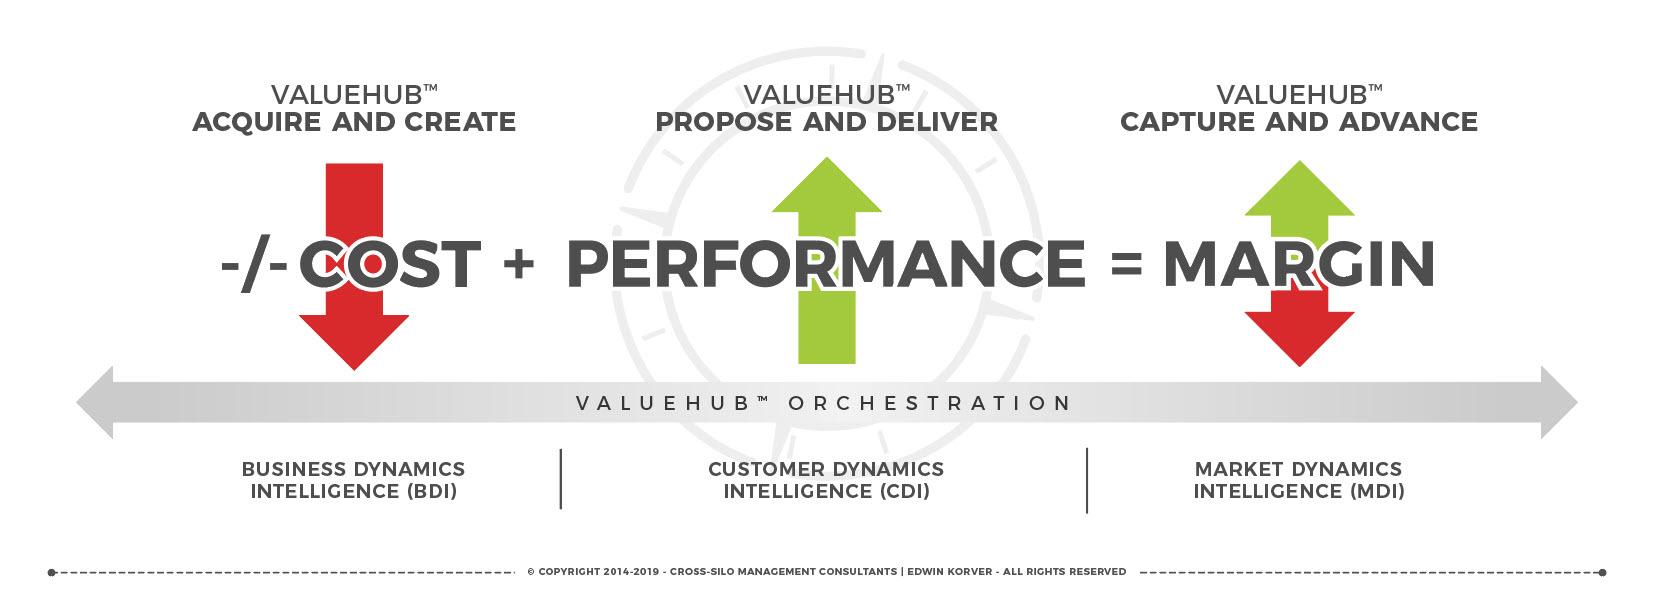 ROUNDMAP-ValueHub-Orchestration